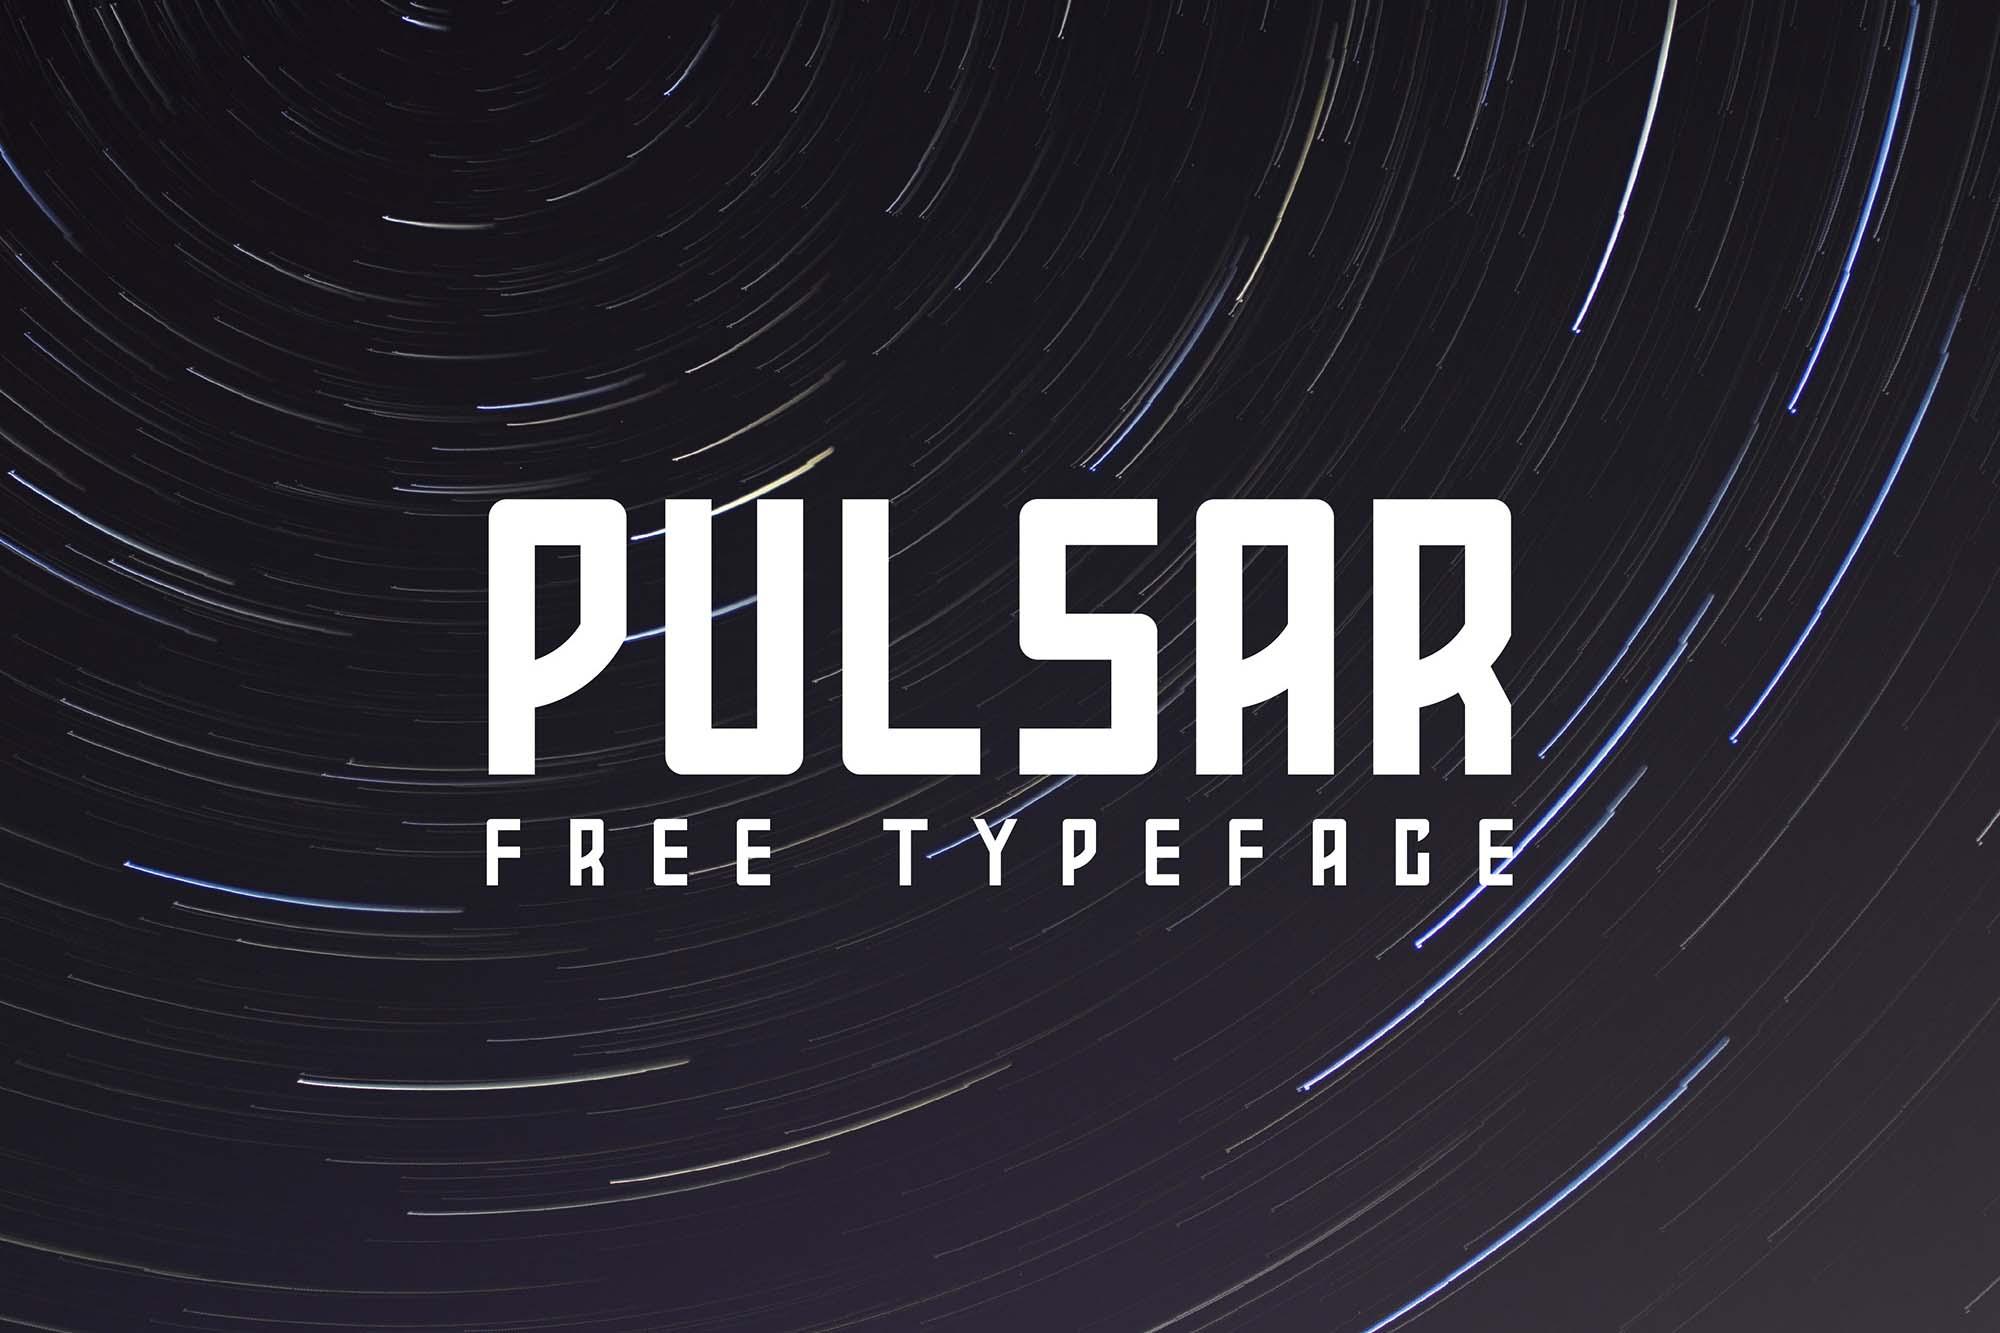 Pulsar Typeface